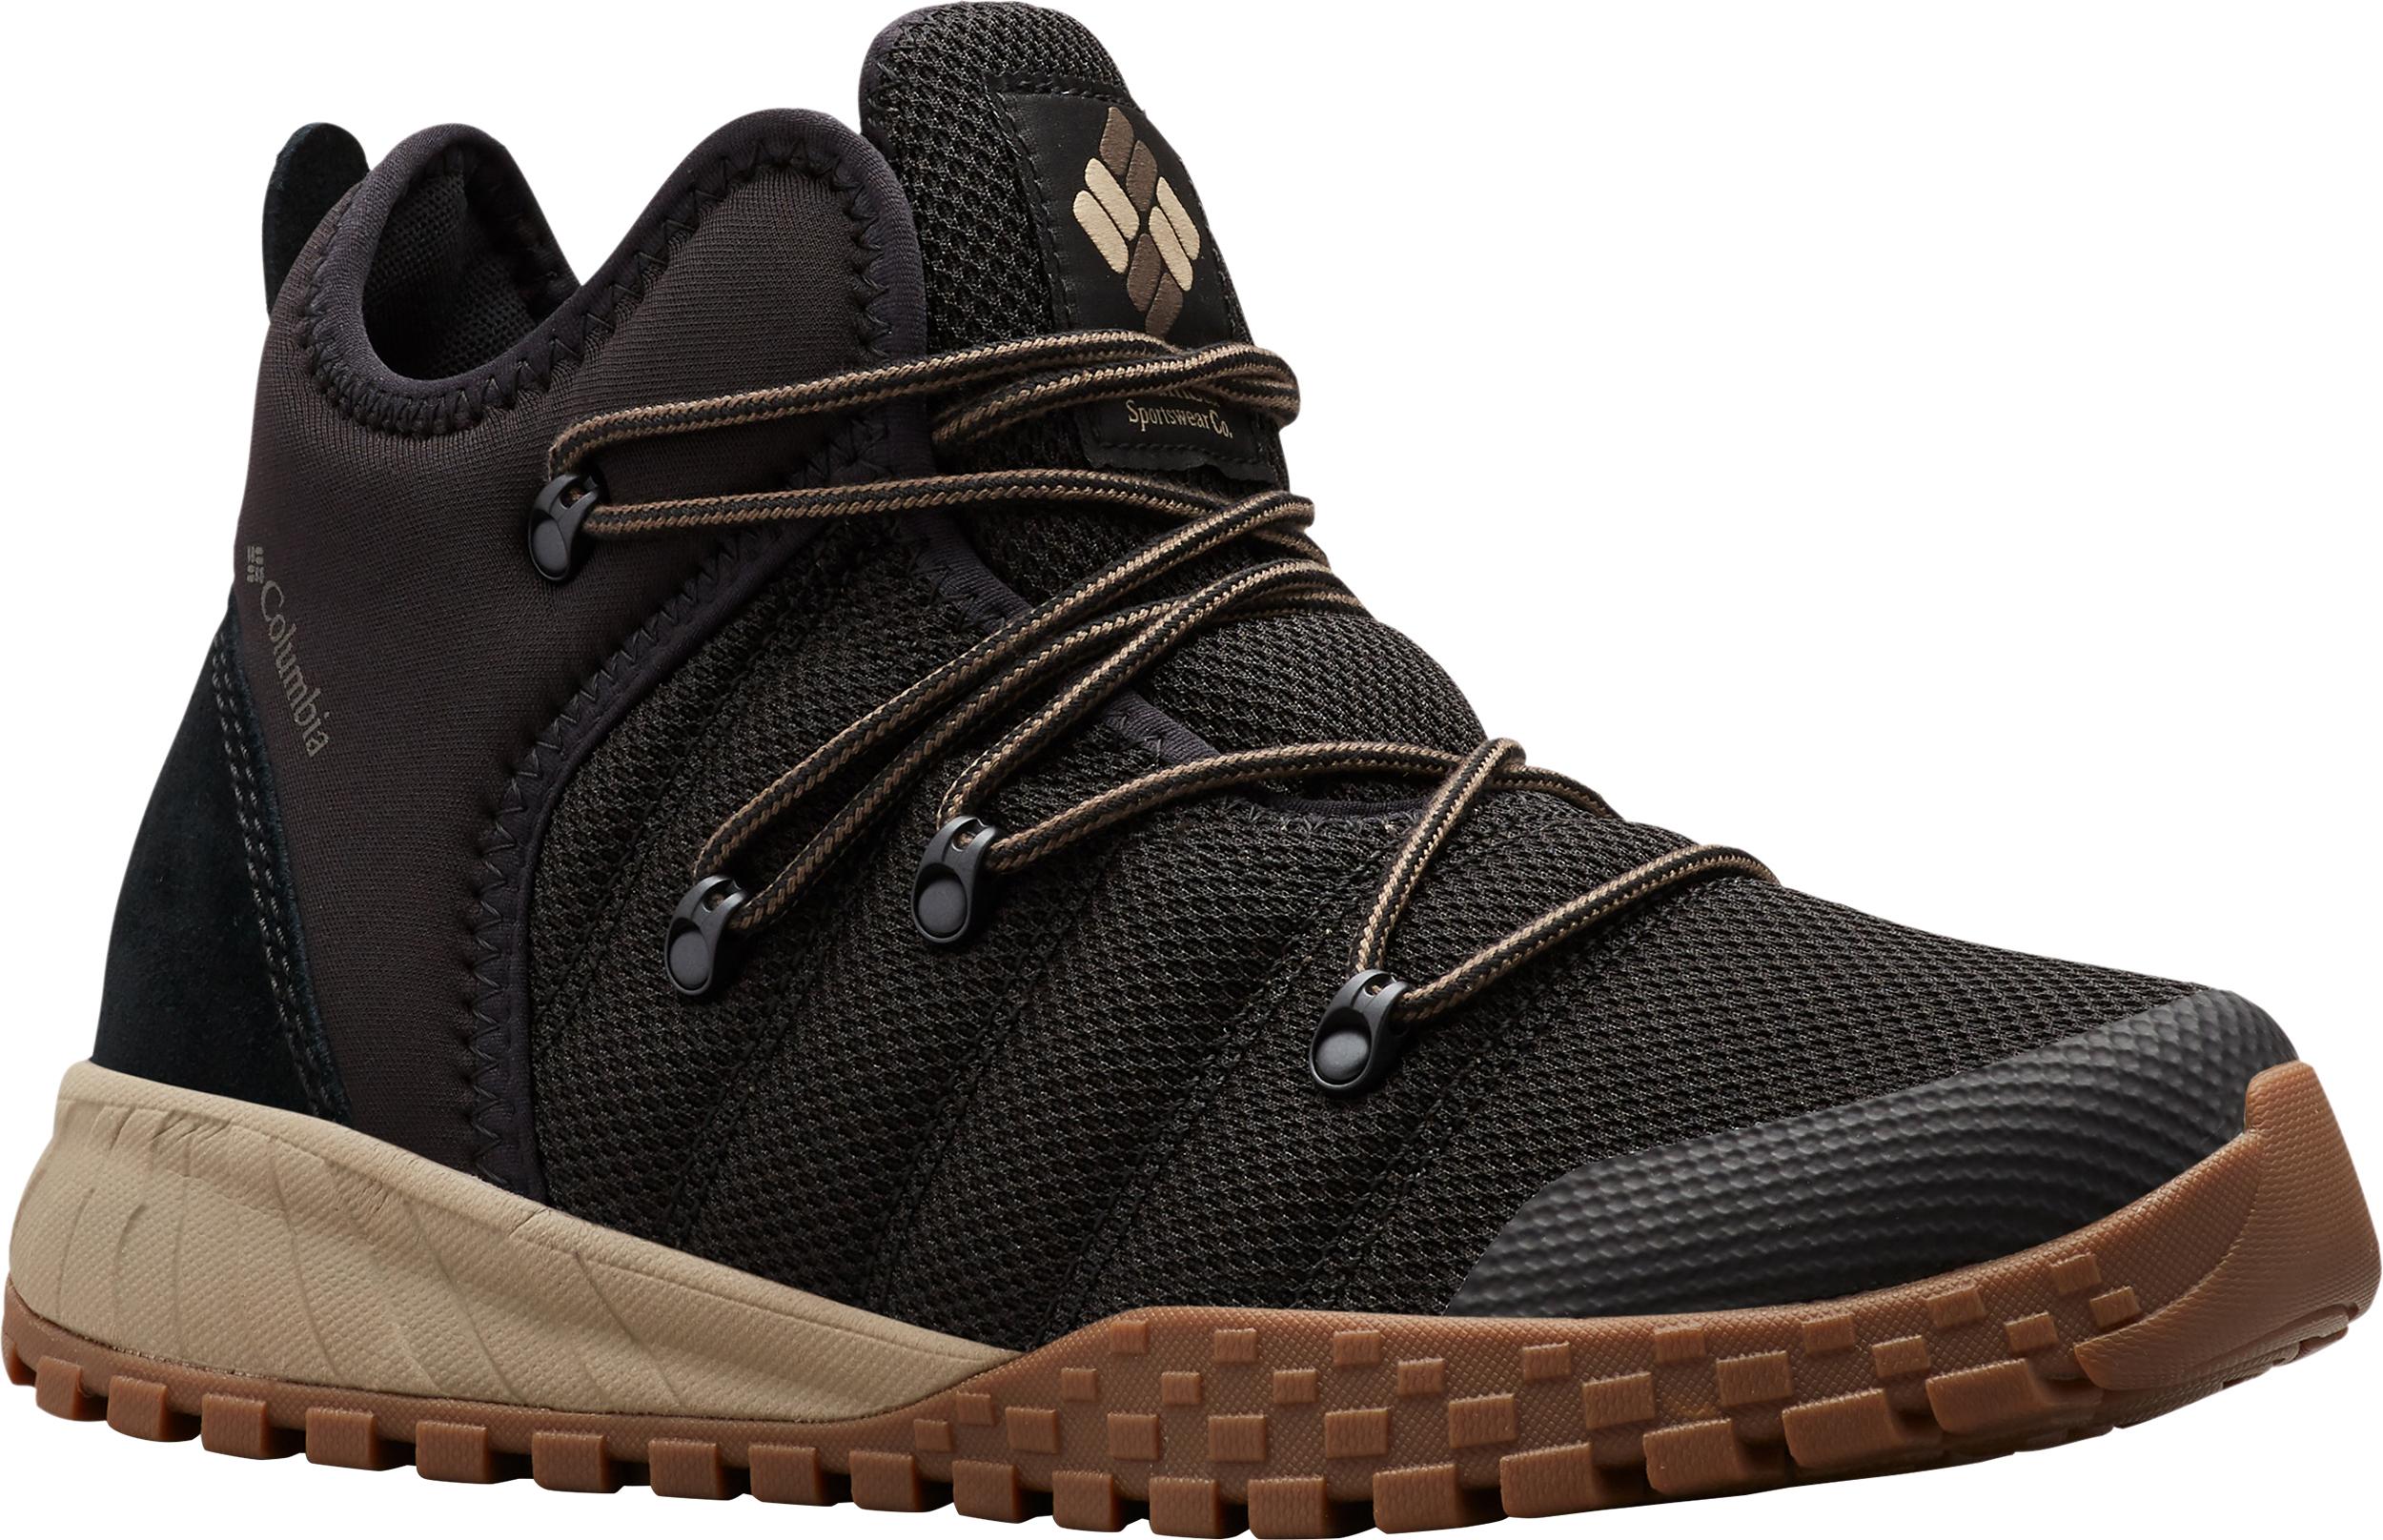 Columbia Fairbanks 503 Waterproof Boots